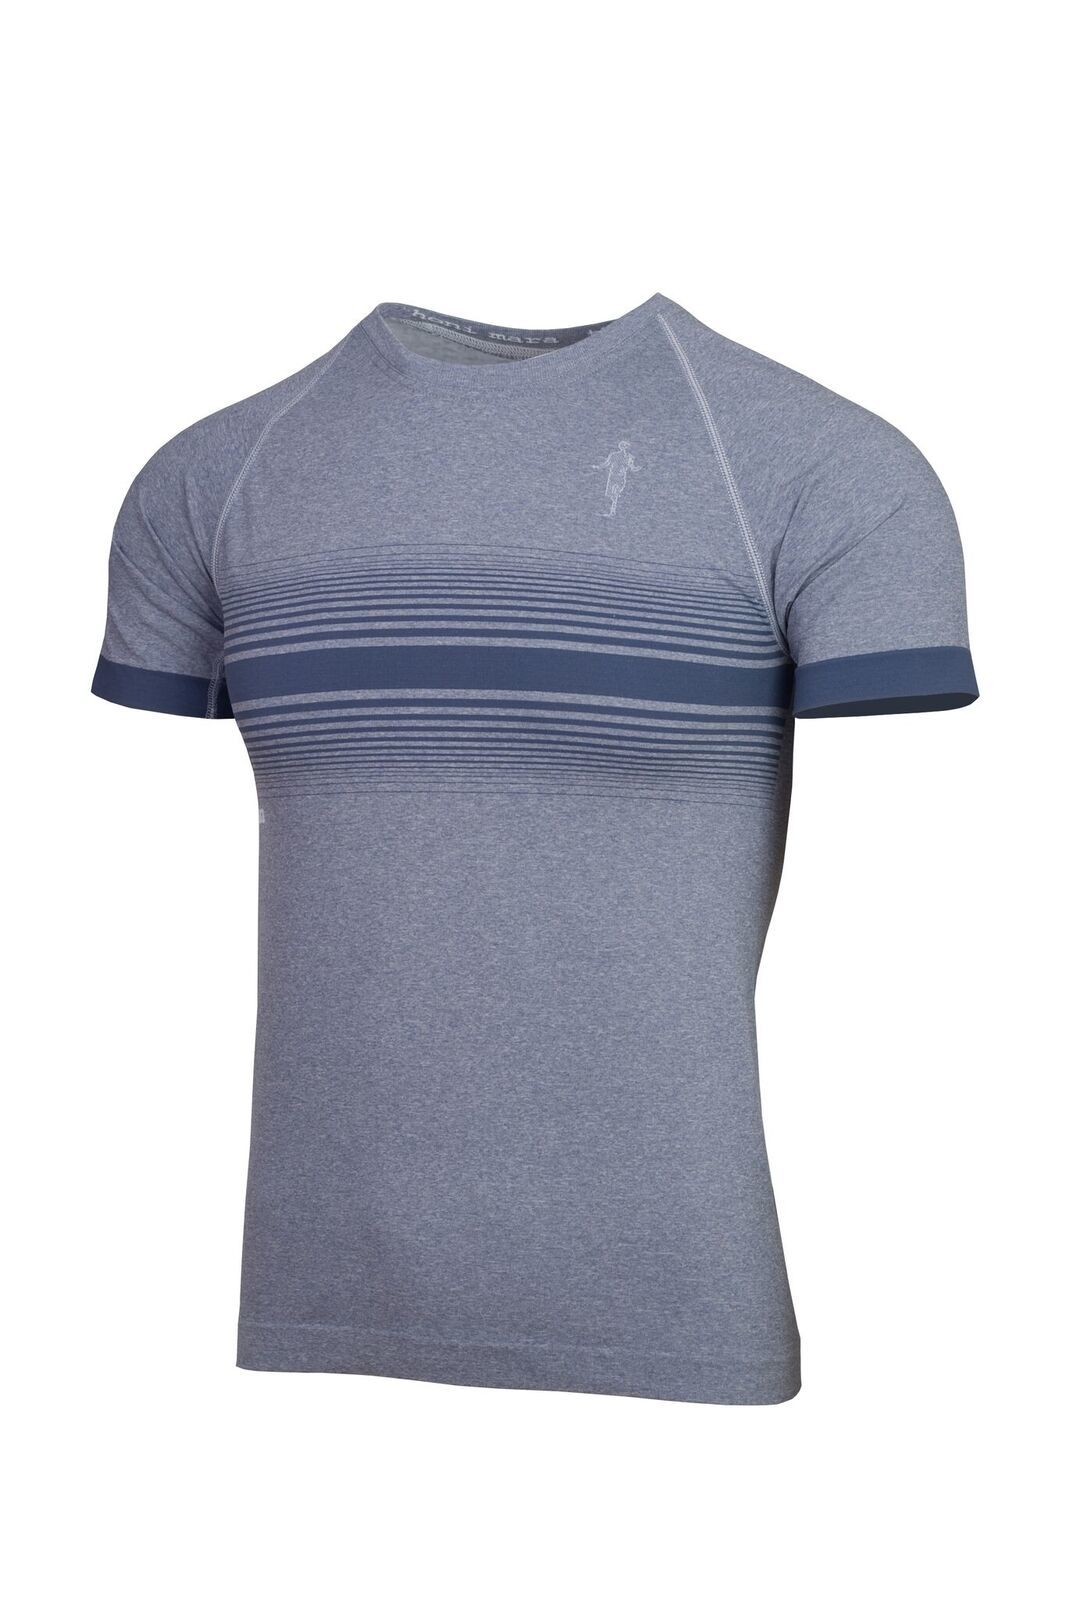 Thonimara Sommer Ti Shirt (Carbon Light)